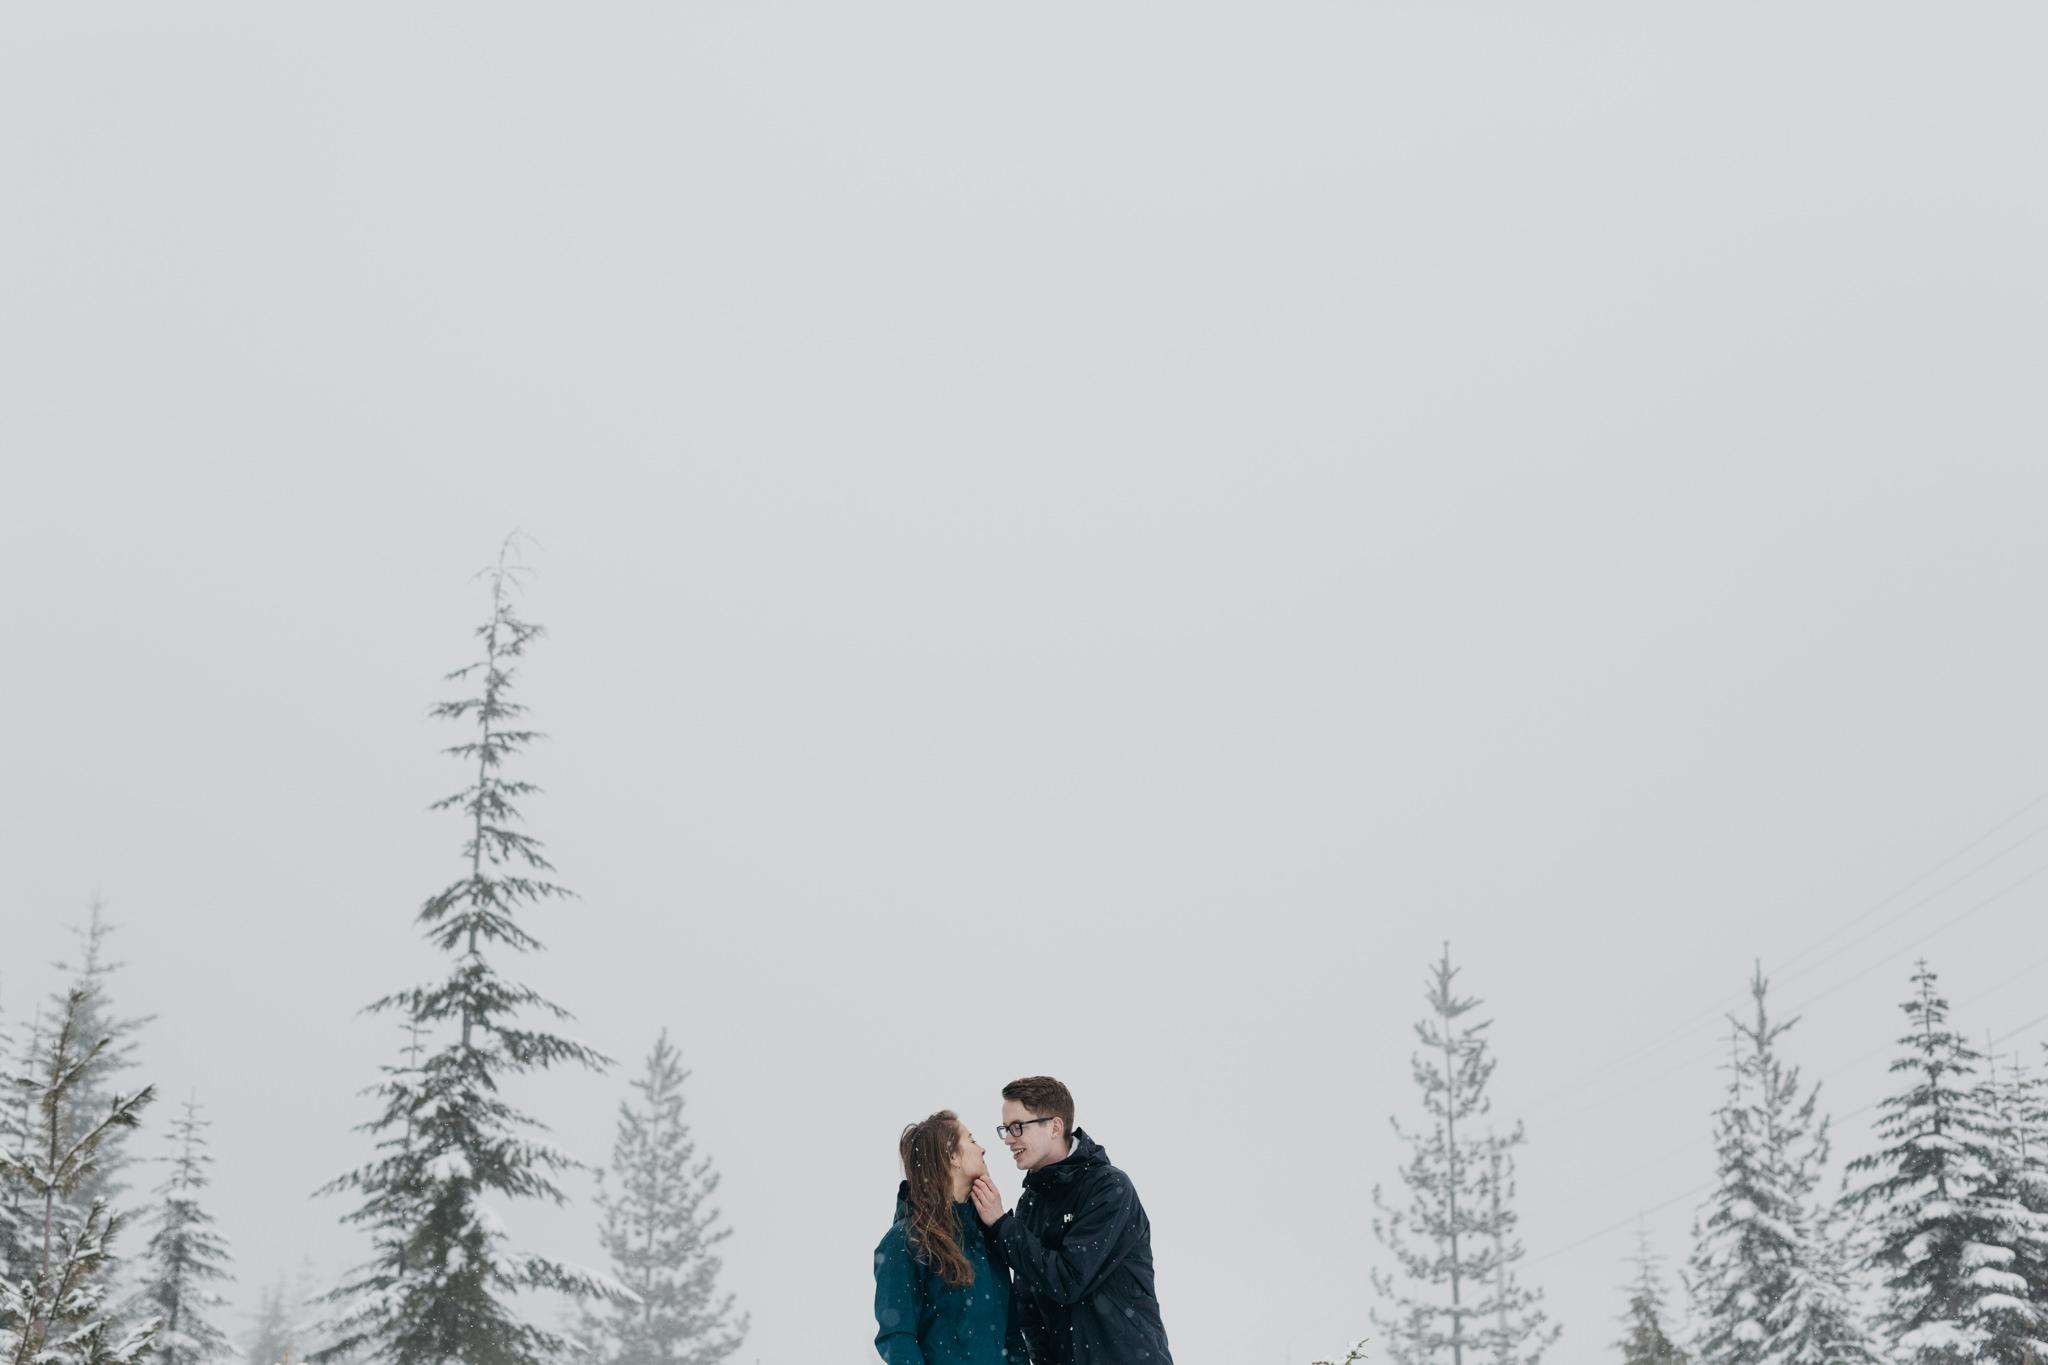 Greg + Jade - Mt Washington Winter Proposal